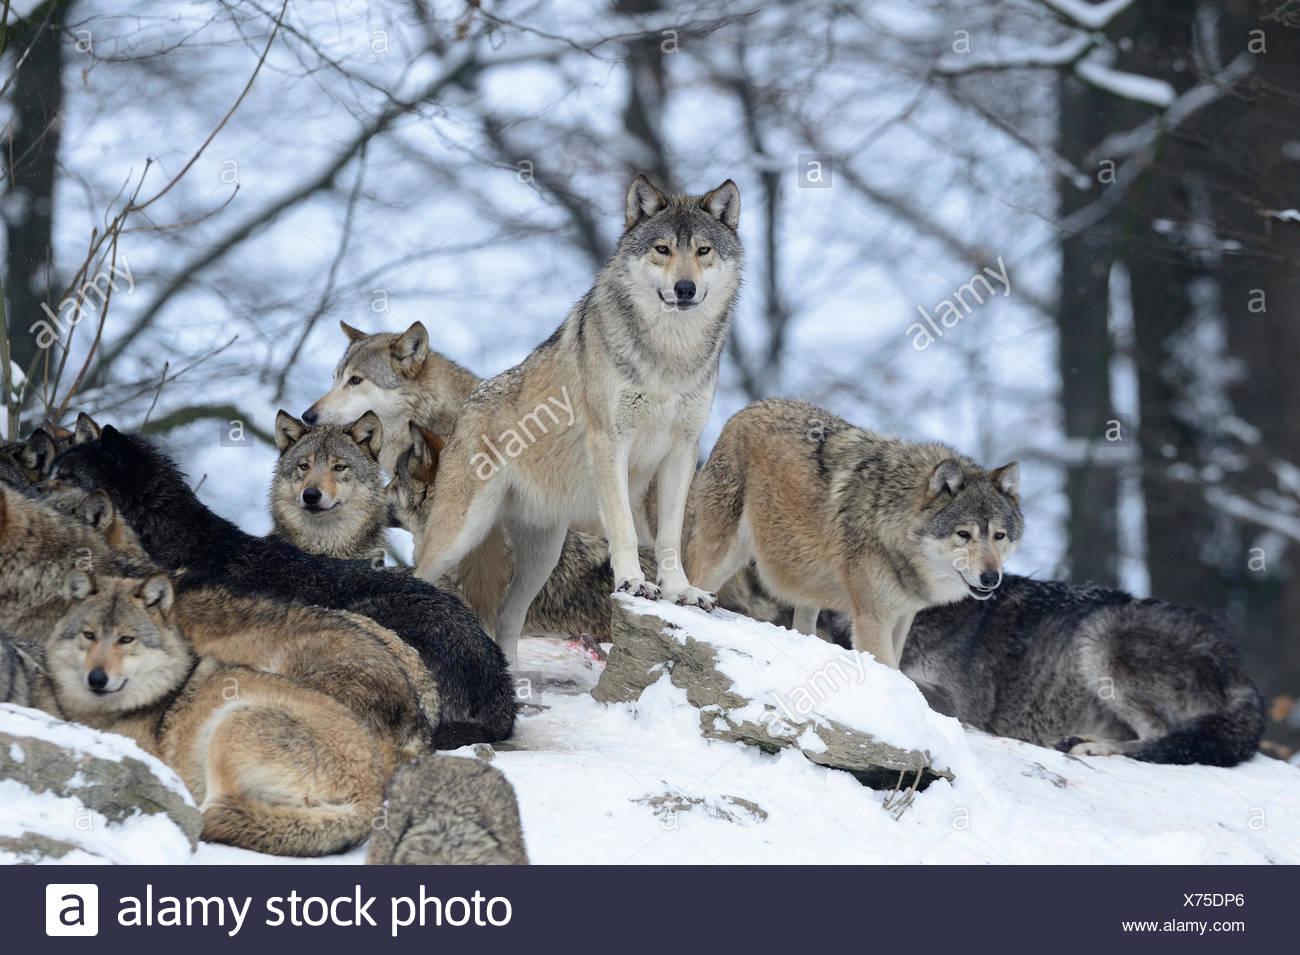 Wolf, animale predatore, lupi, predatori, lupo, canidi, Canis lupus lycaon, Germania, Europa Foto Stock